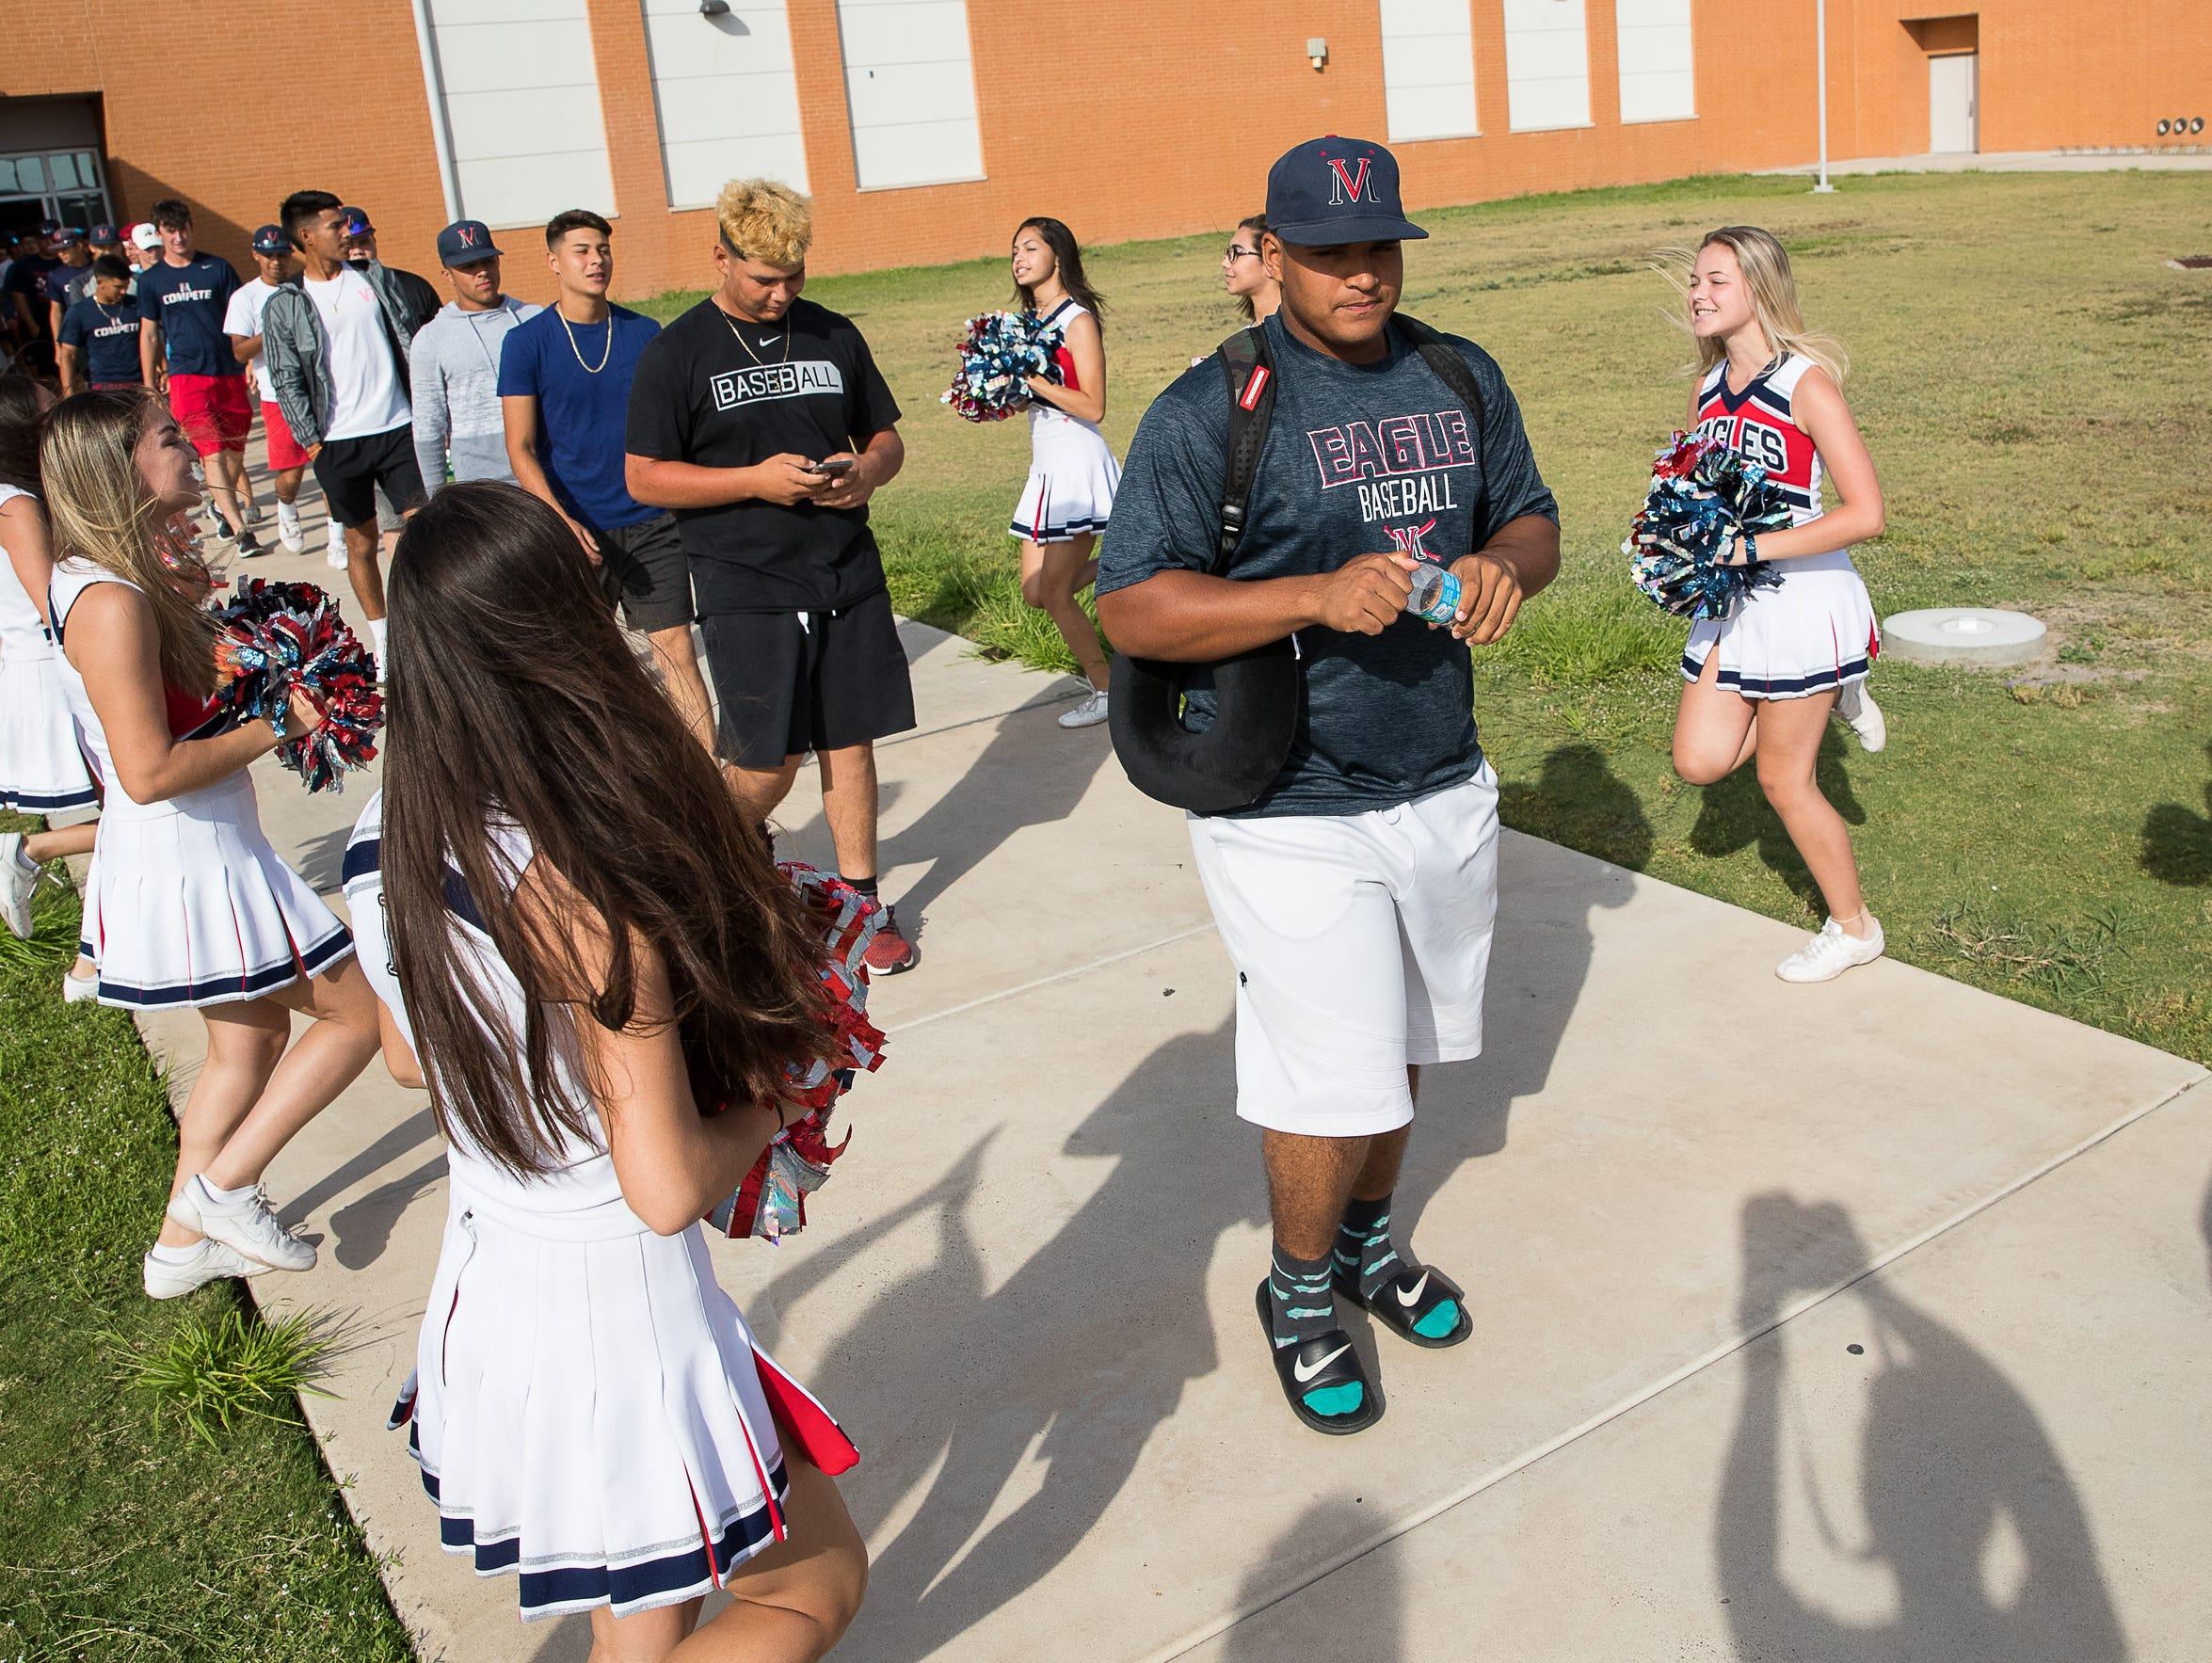 Veterans Memorial High School baseball team board a